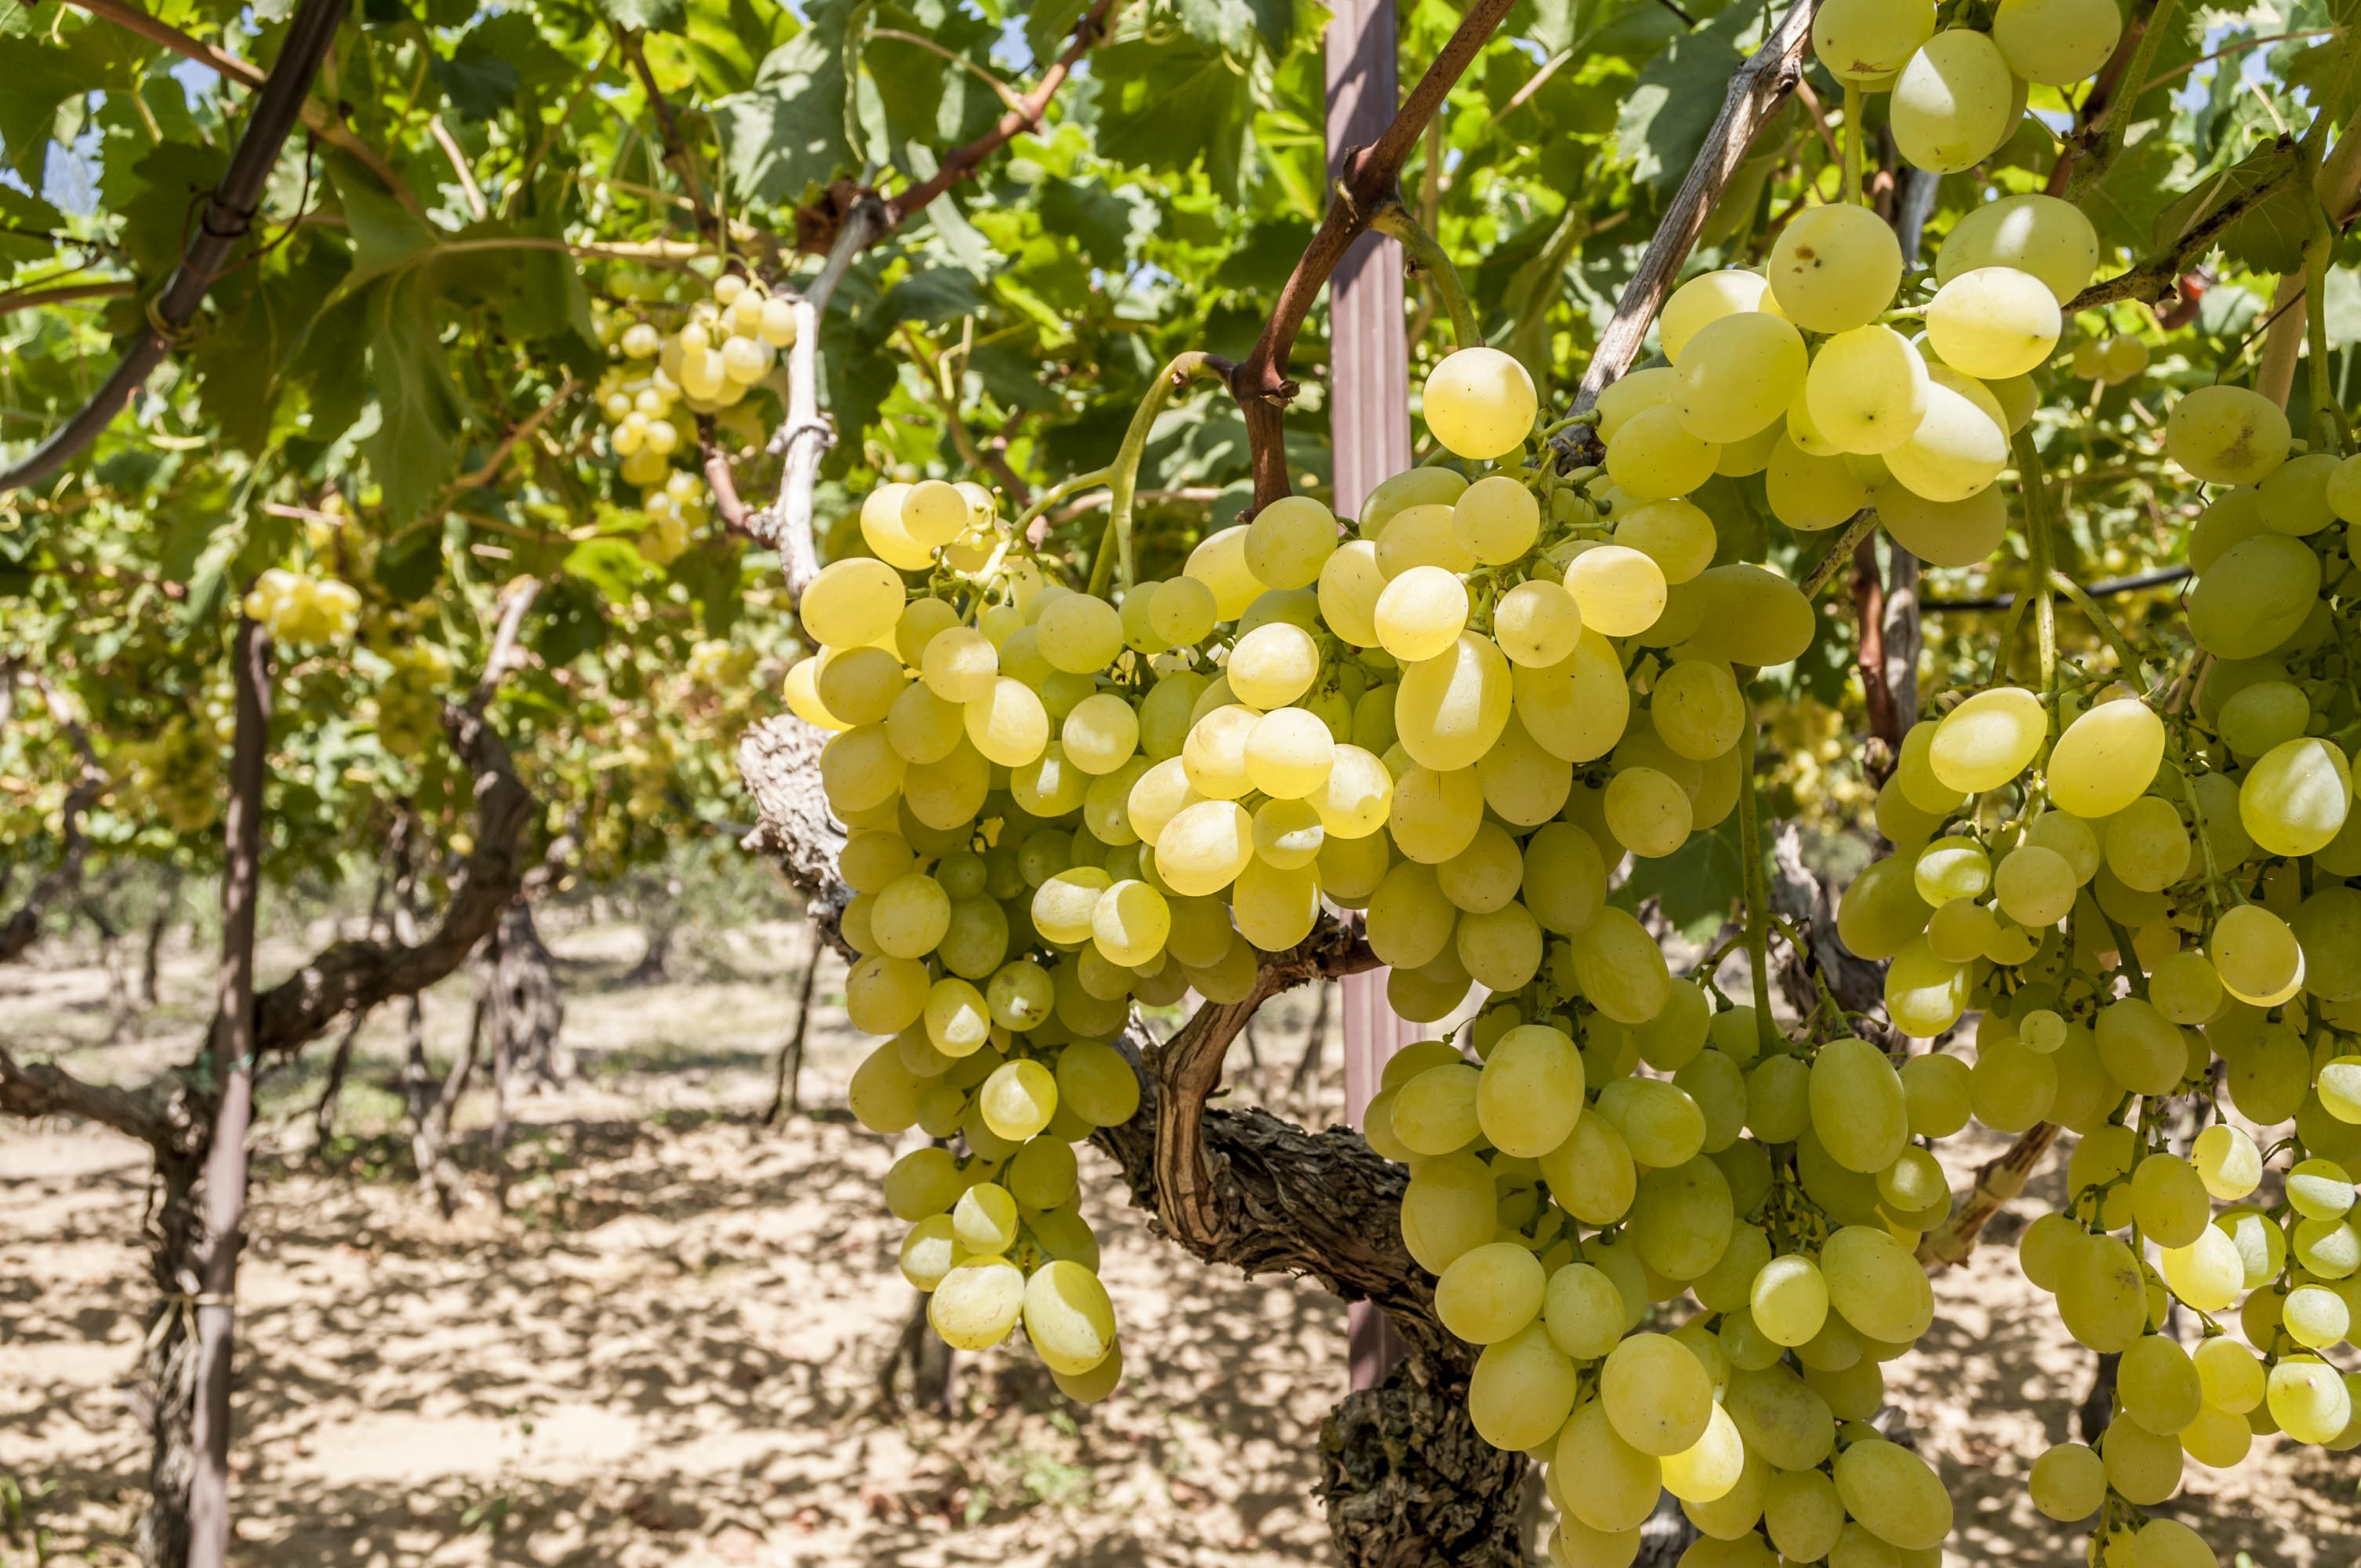 Grappoli d'uva bio